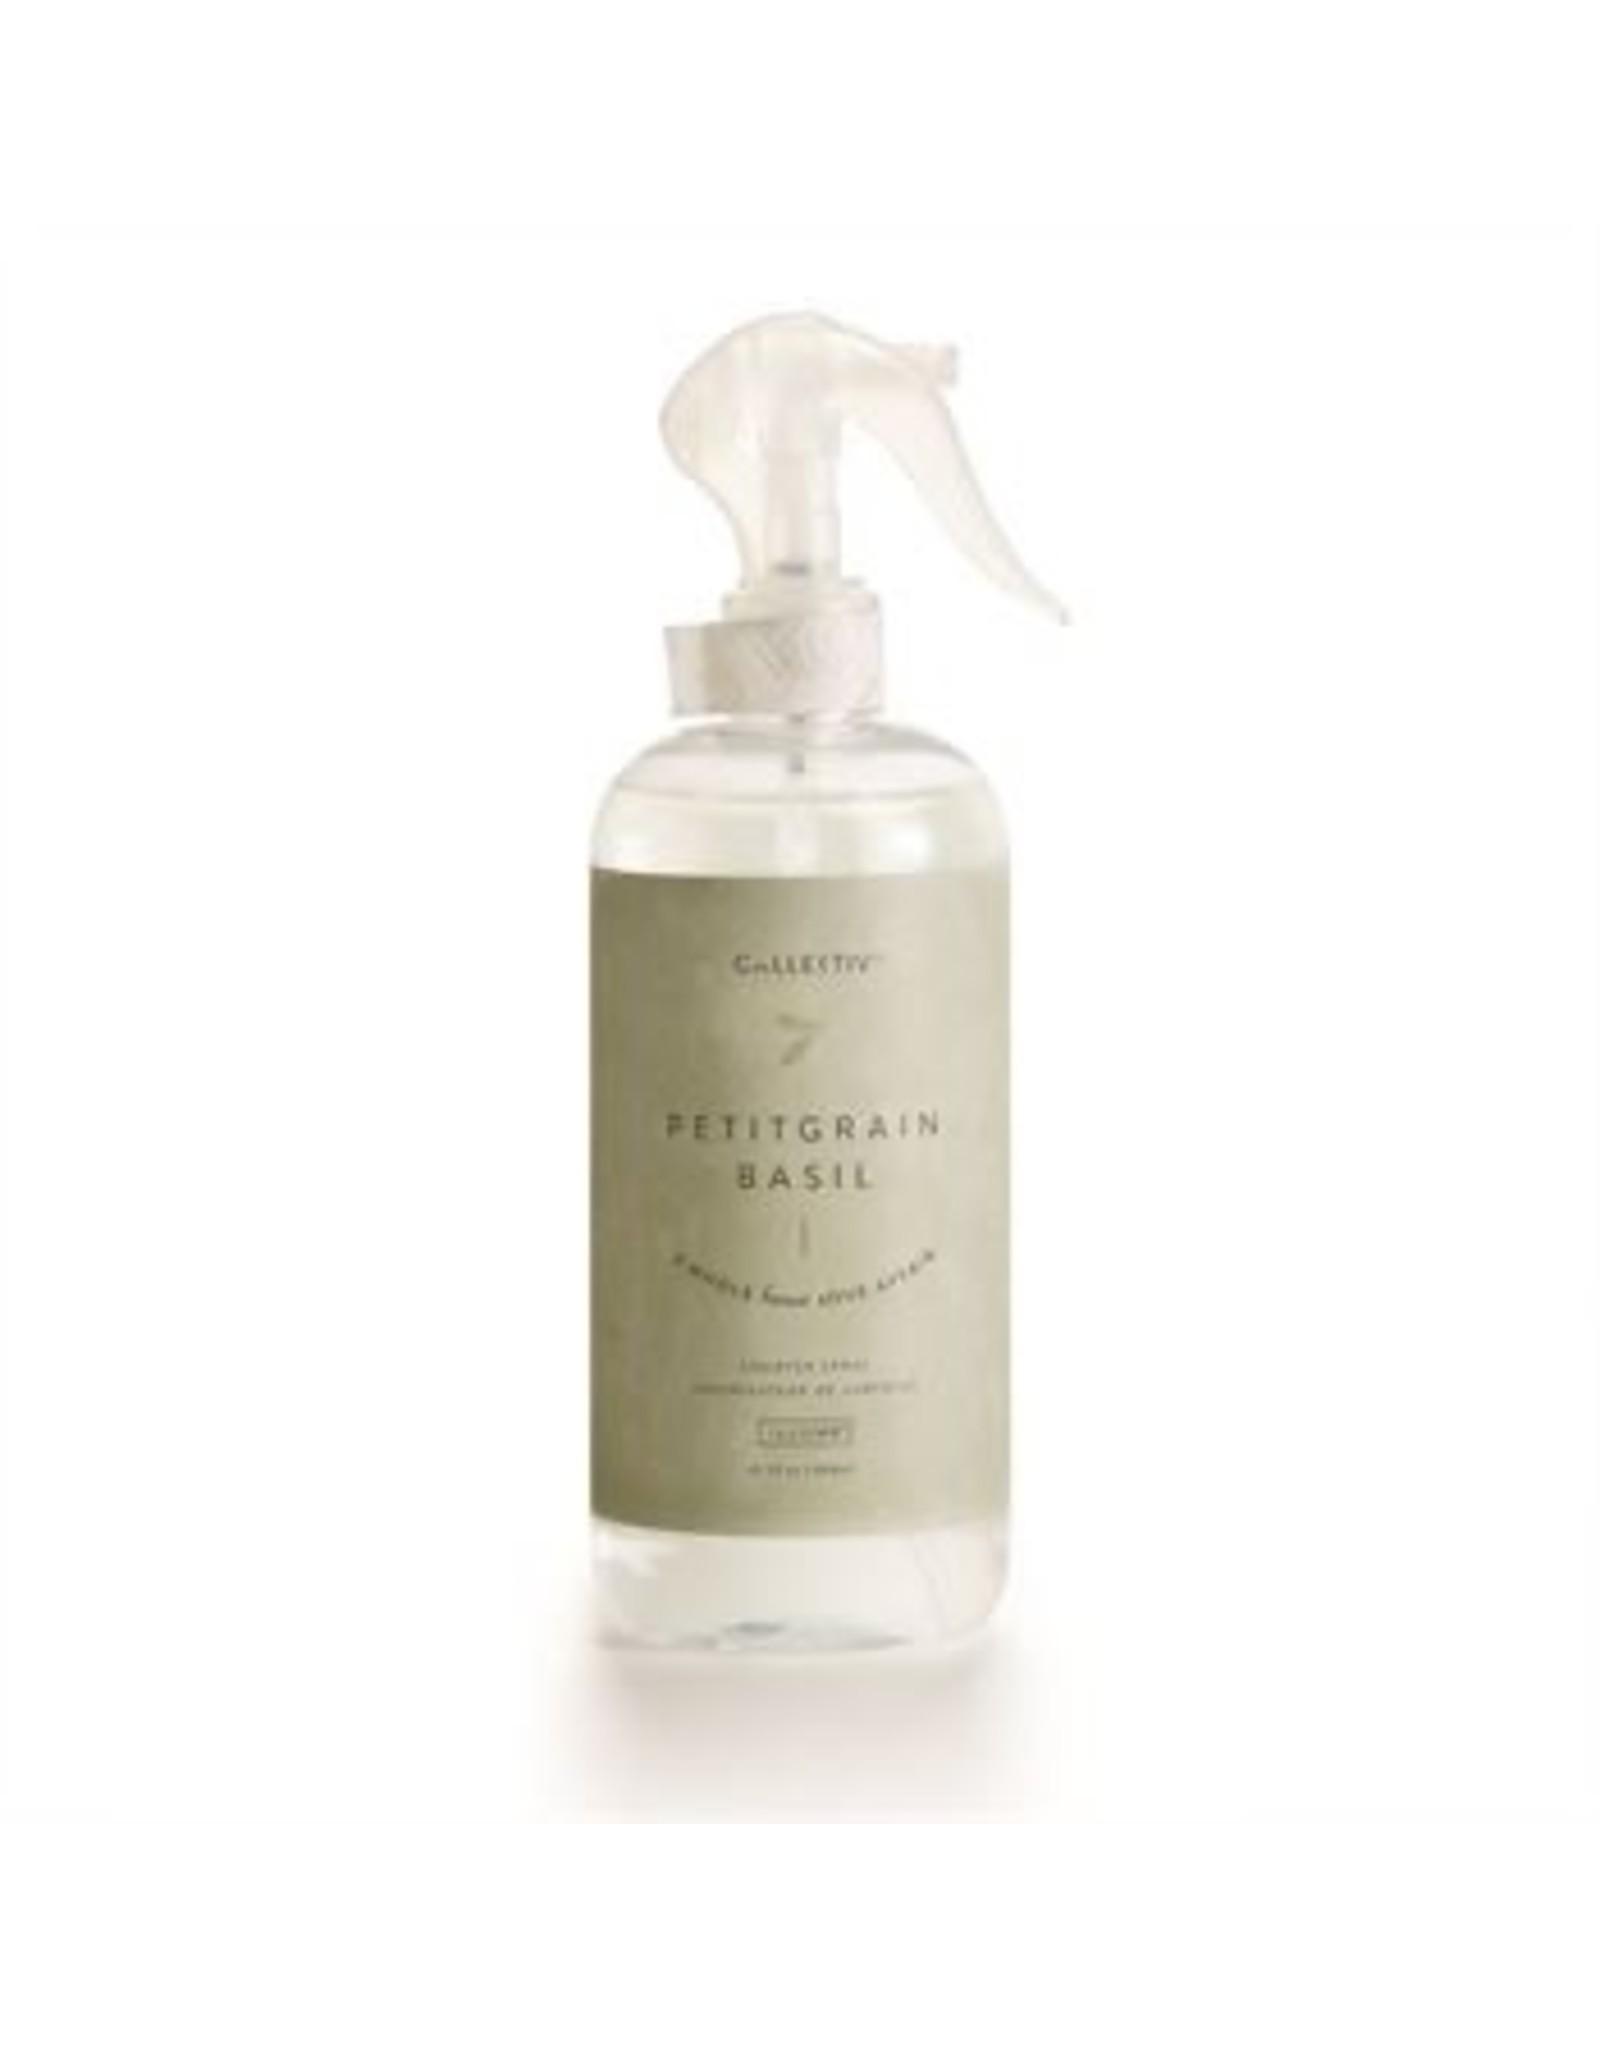 Illume Collectiv Petitgrain Basil Counter Spray 16.5 fl oz